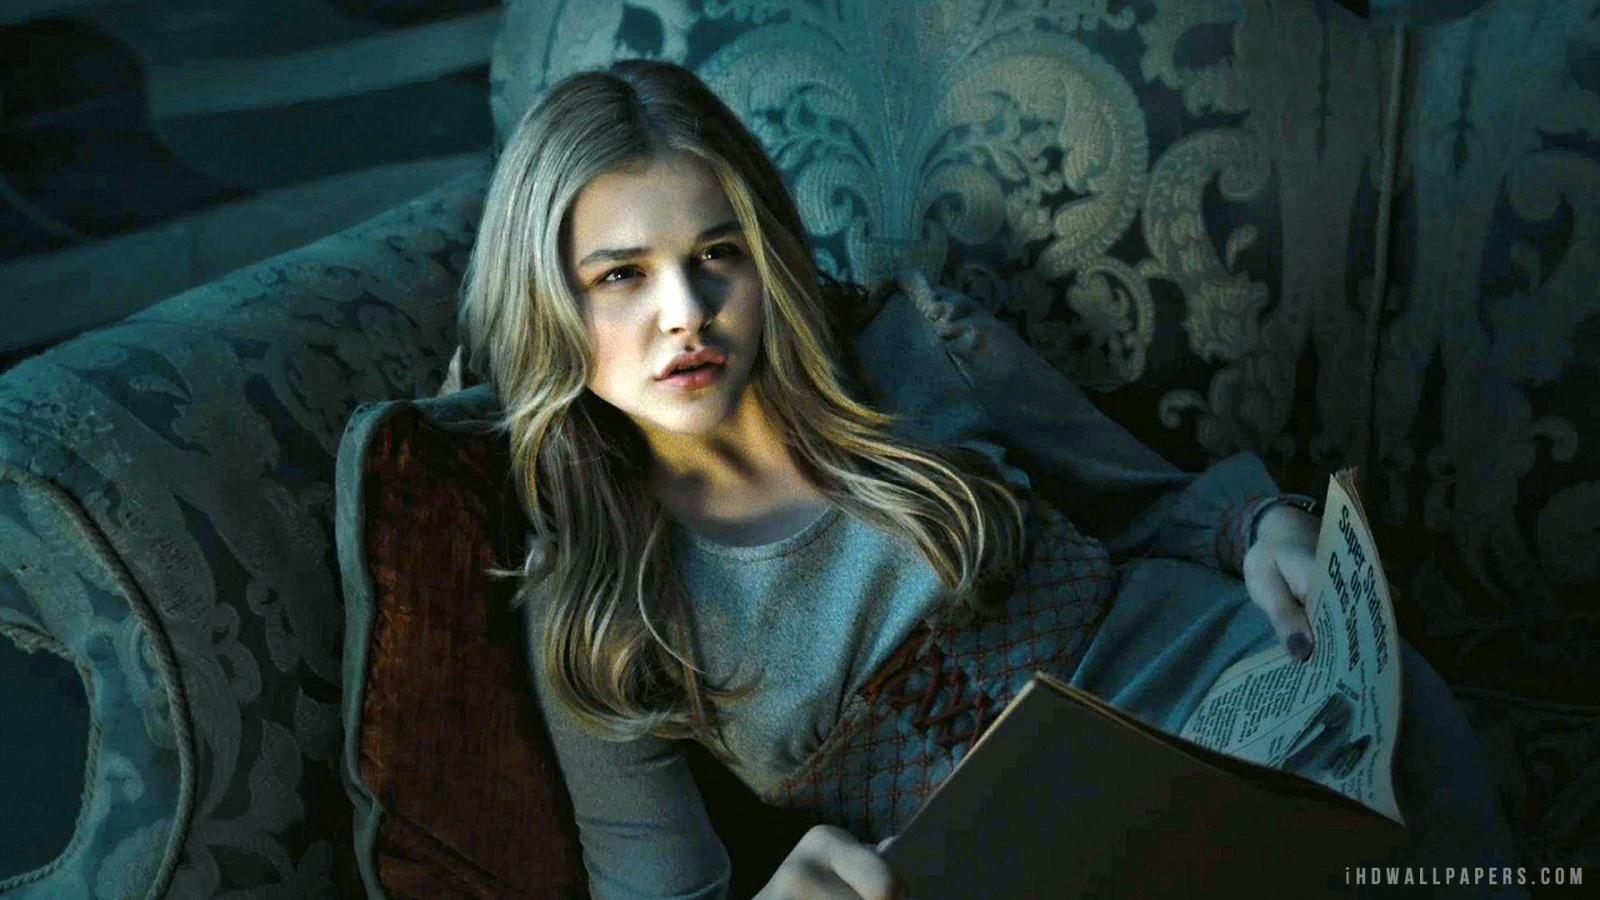 Description Download Chloe Grace Moretz in Dark Shadows Wallpaper 1600x900